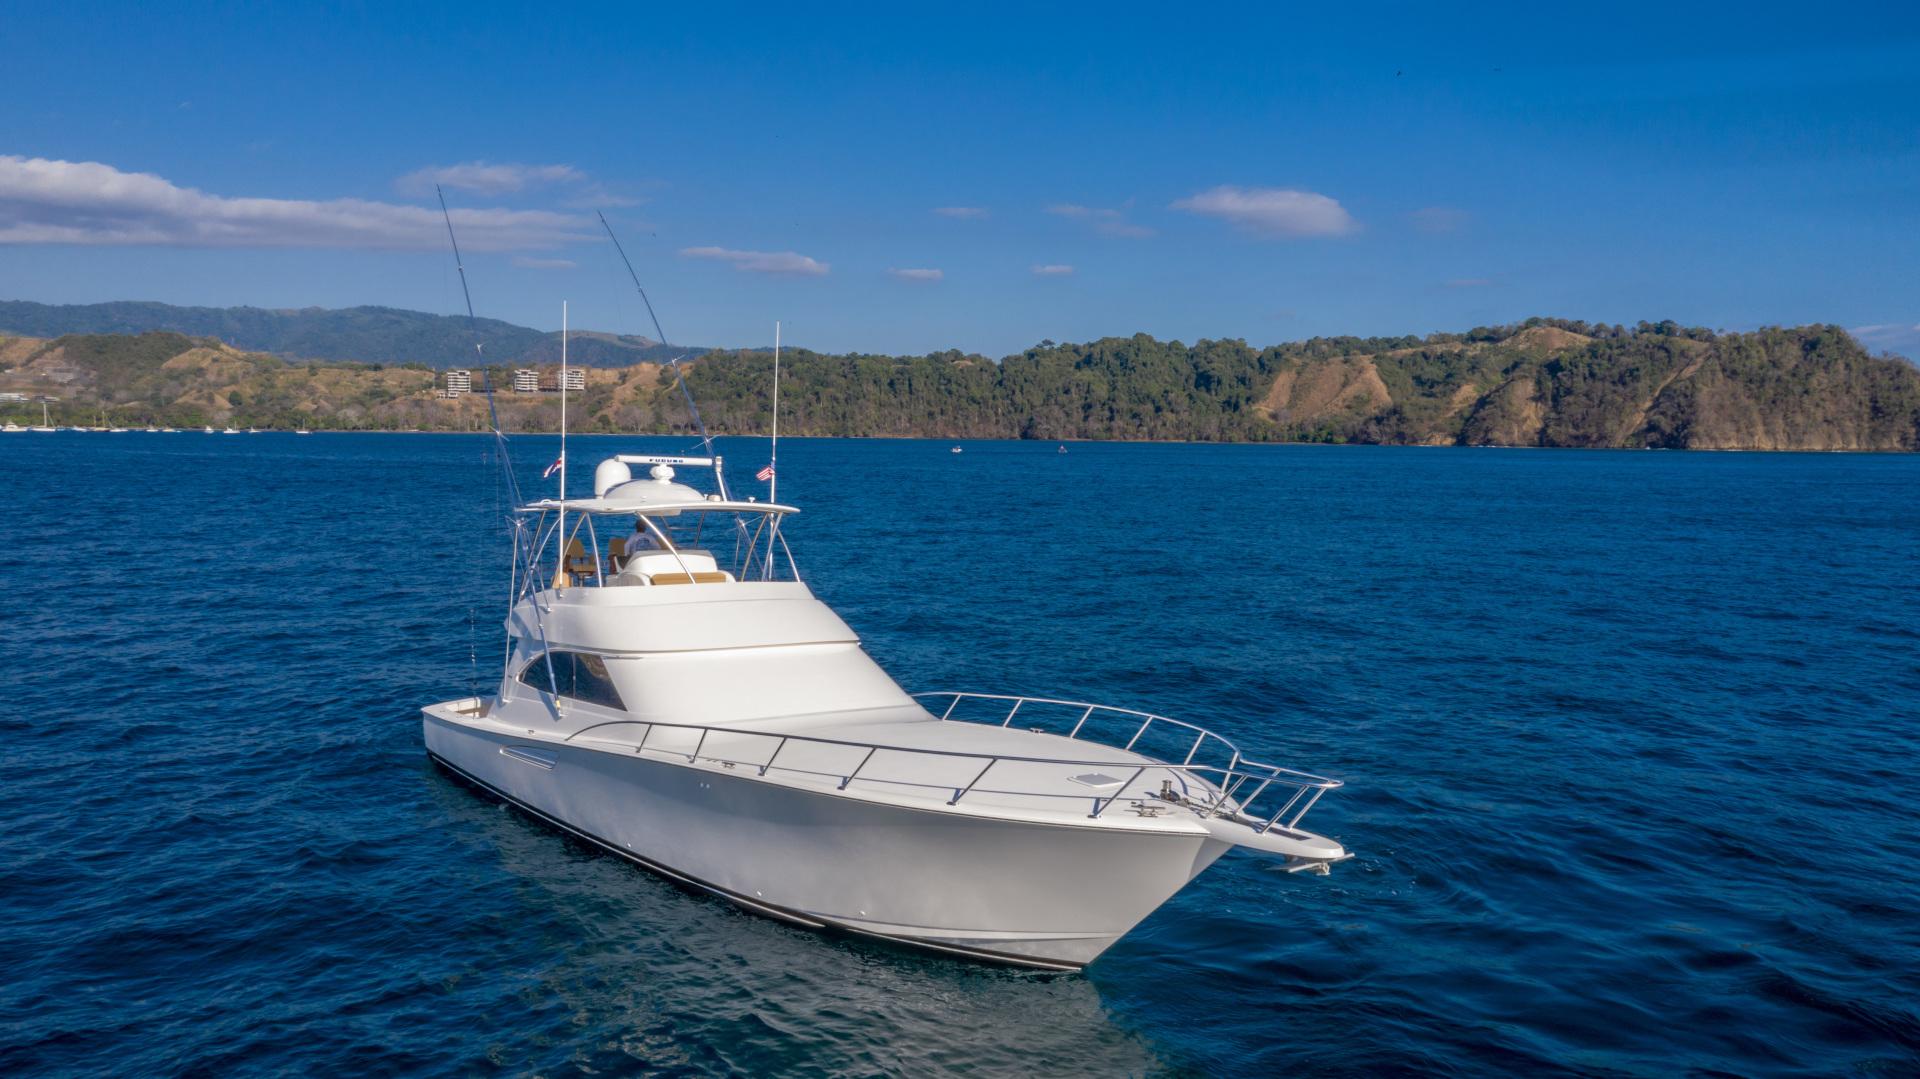 Viking-62 Convertible 2014-Mixer Playa Herradura, Los Suenos,-Costa Rica-2014 Viking 62 Convertible  Starboard Profile-1356267 | Thumbnail